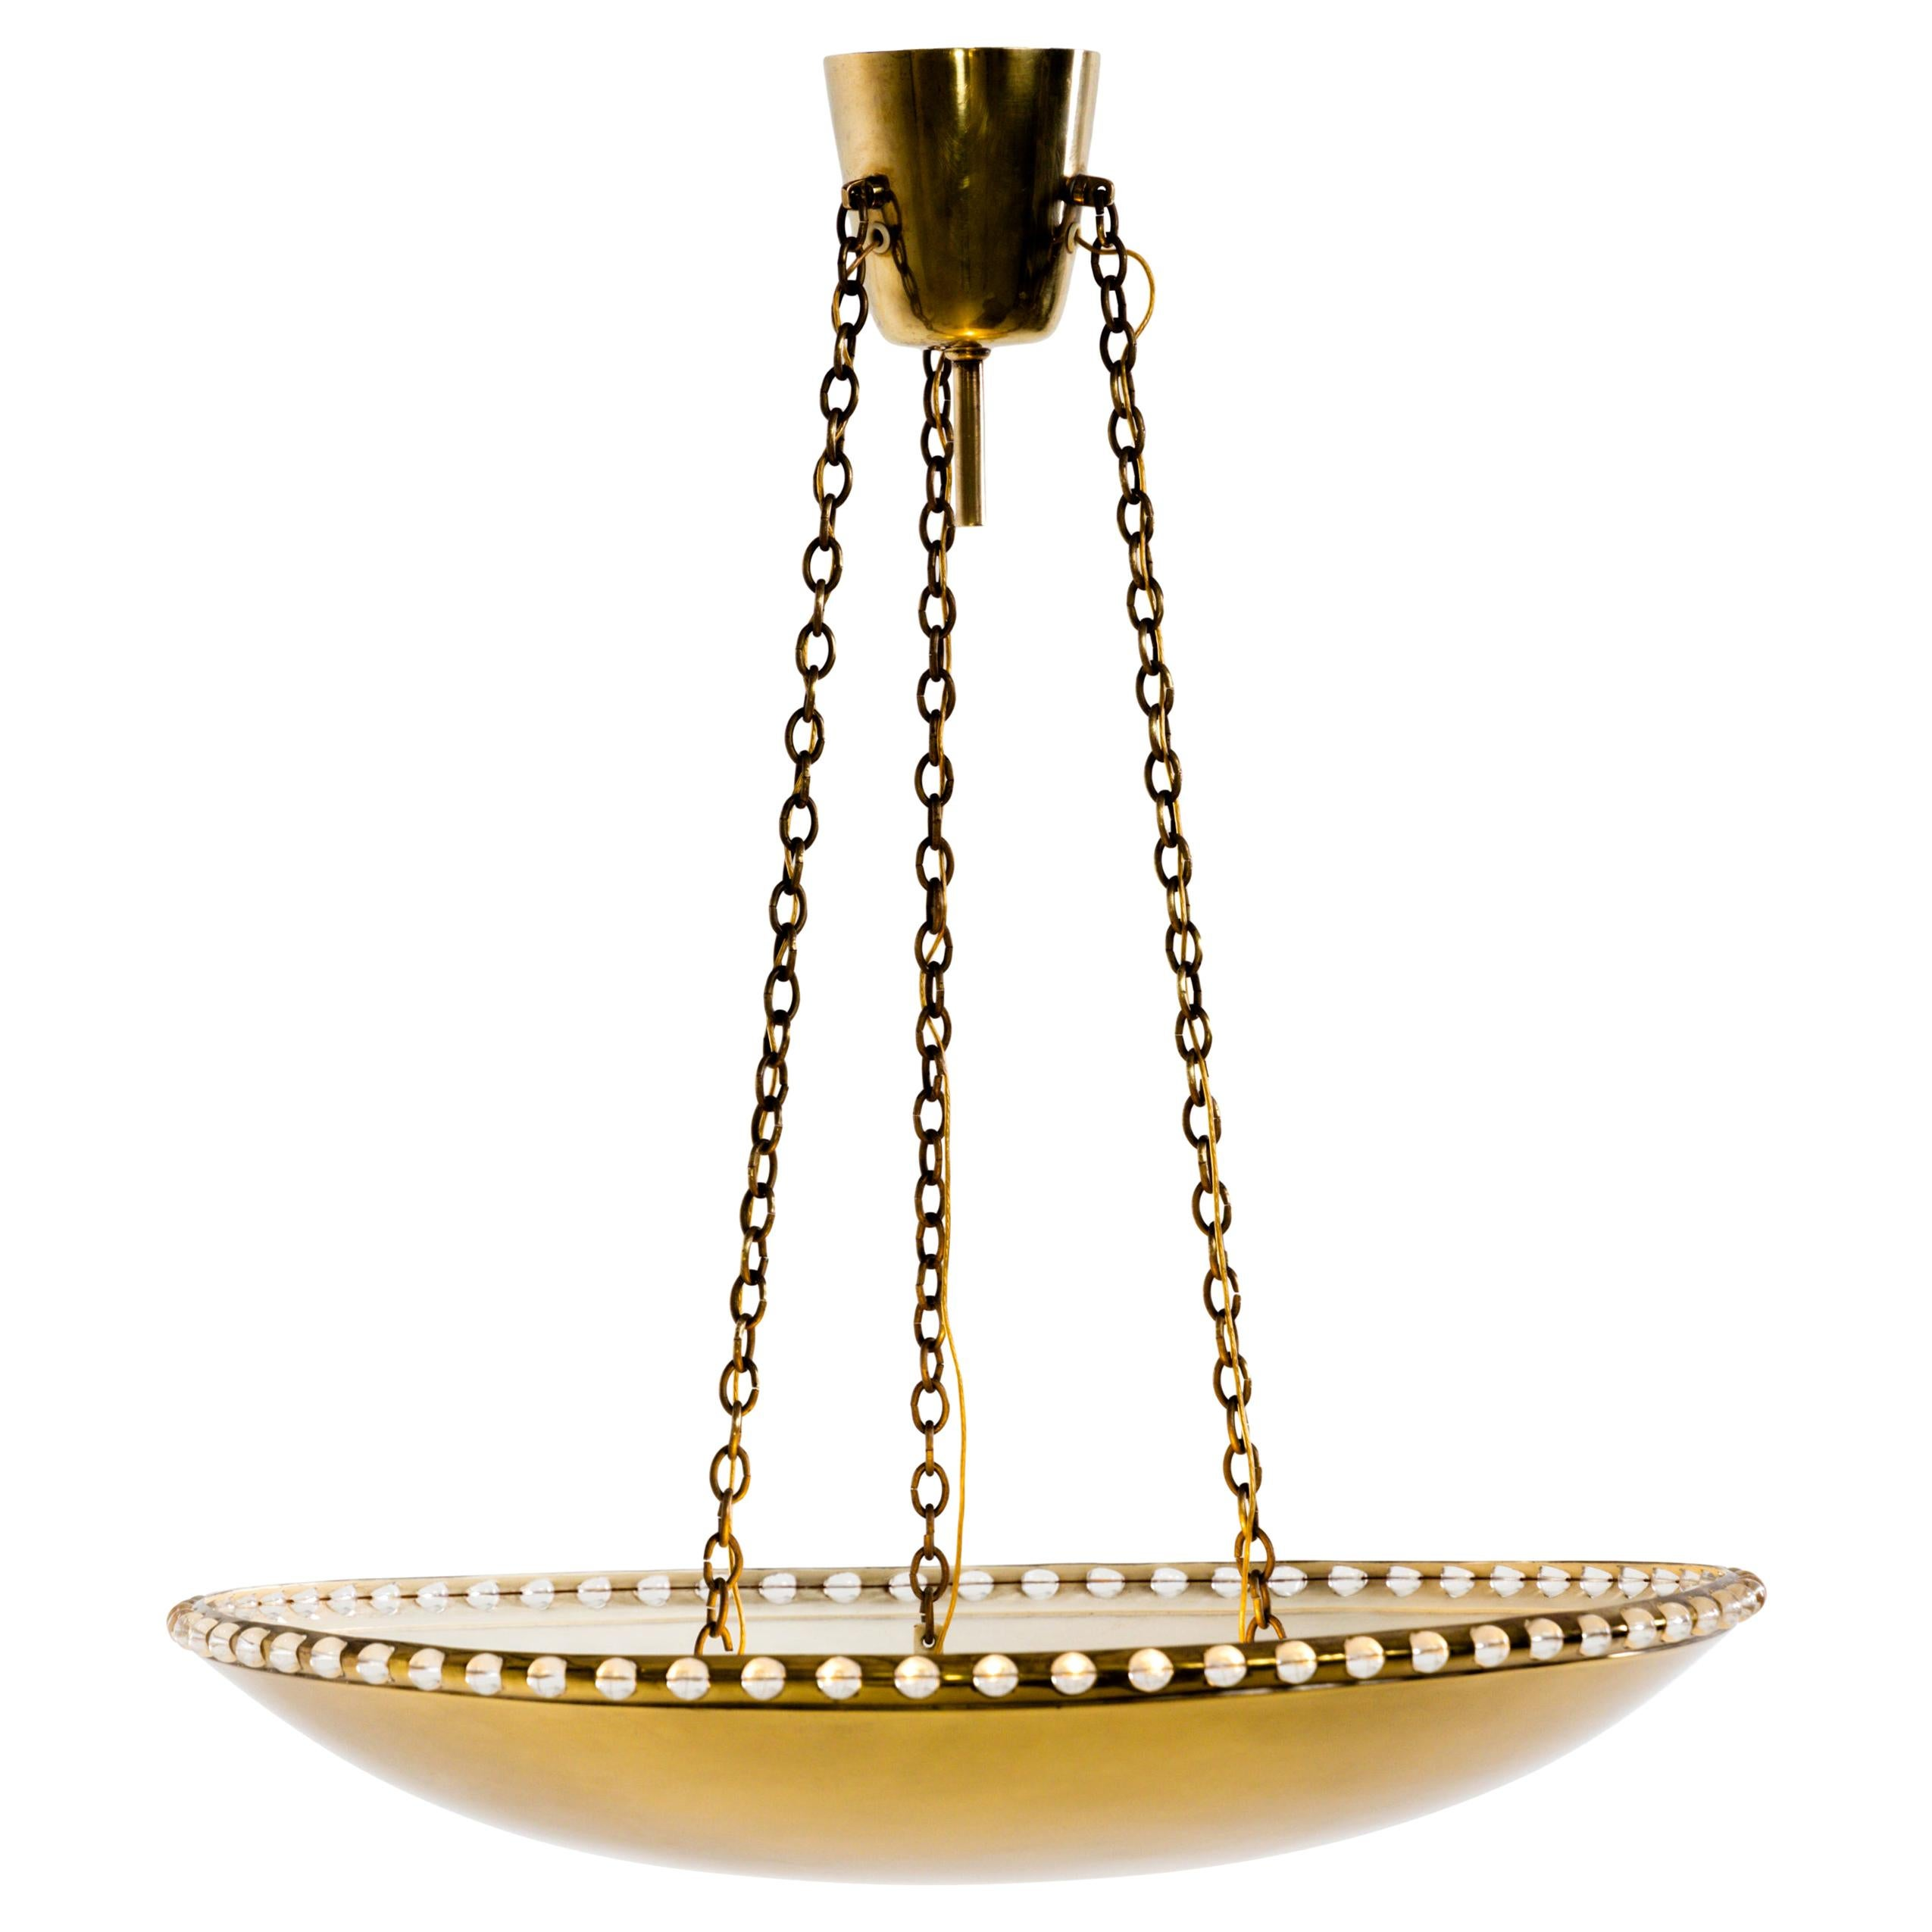 Midcentury Brass Pendant Lamp, 1970s